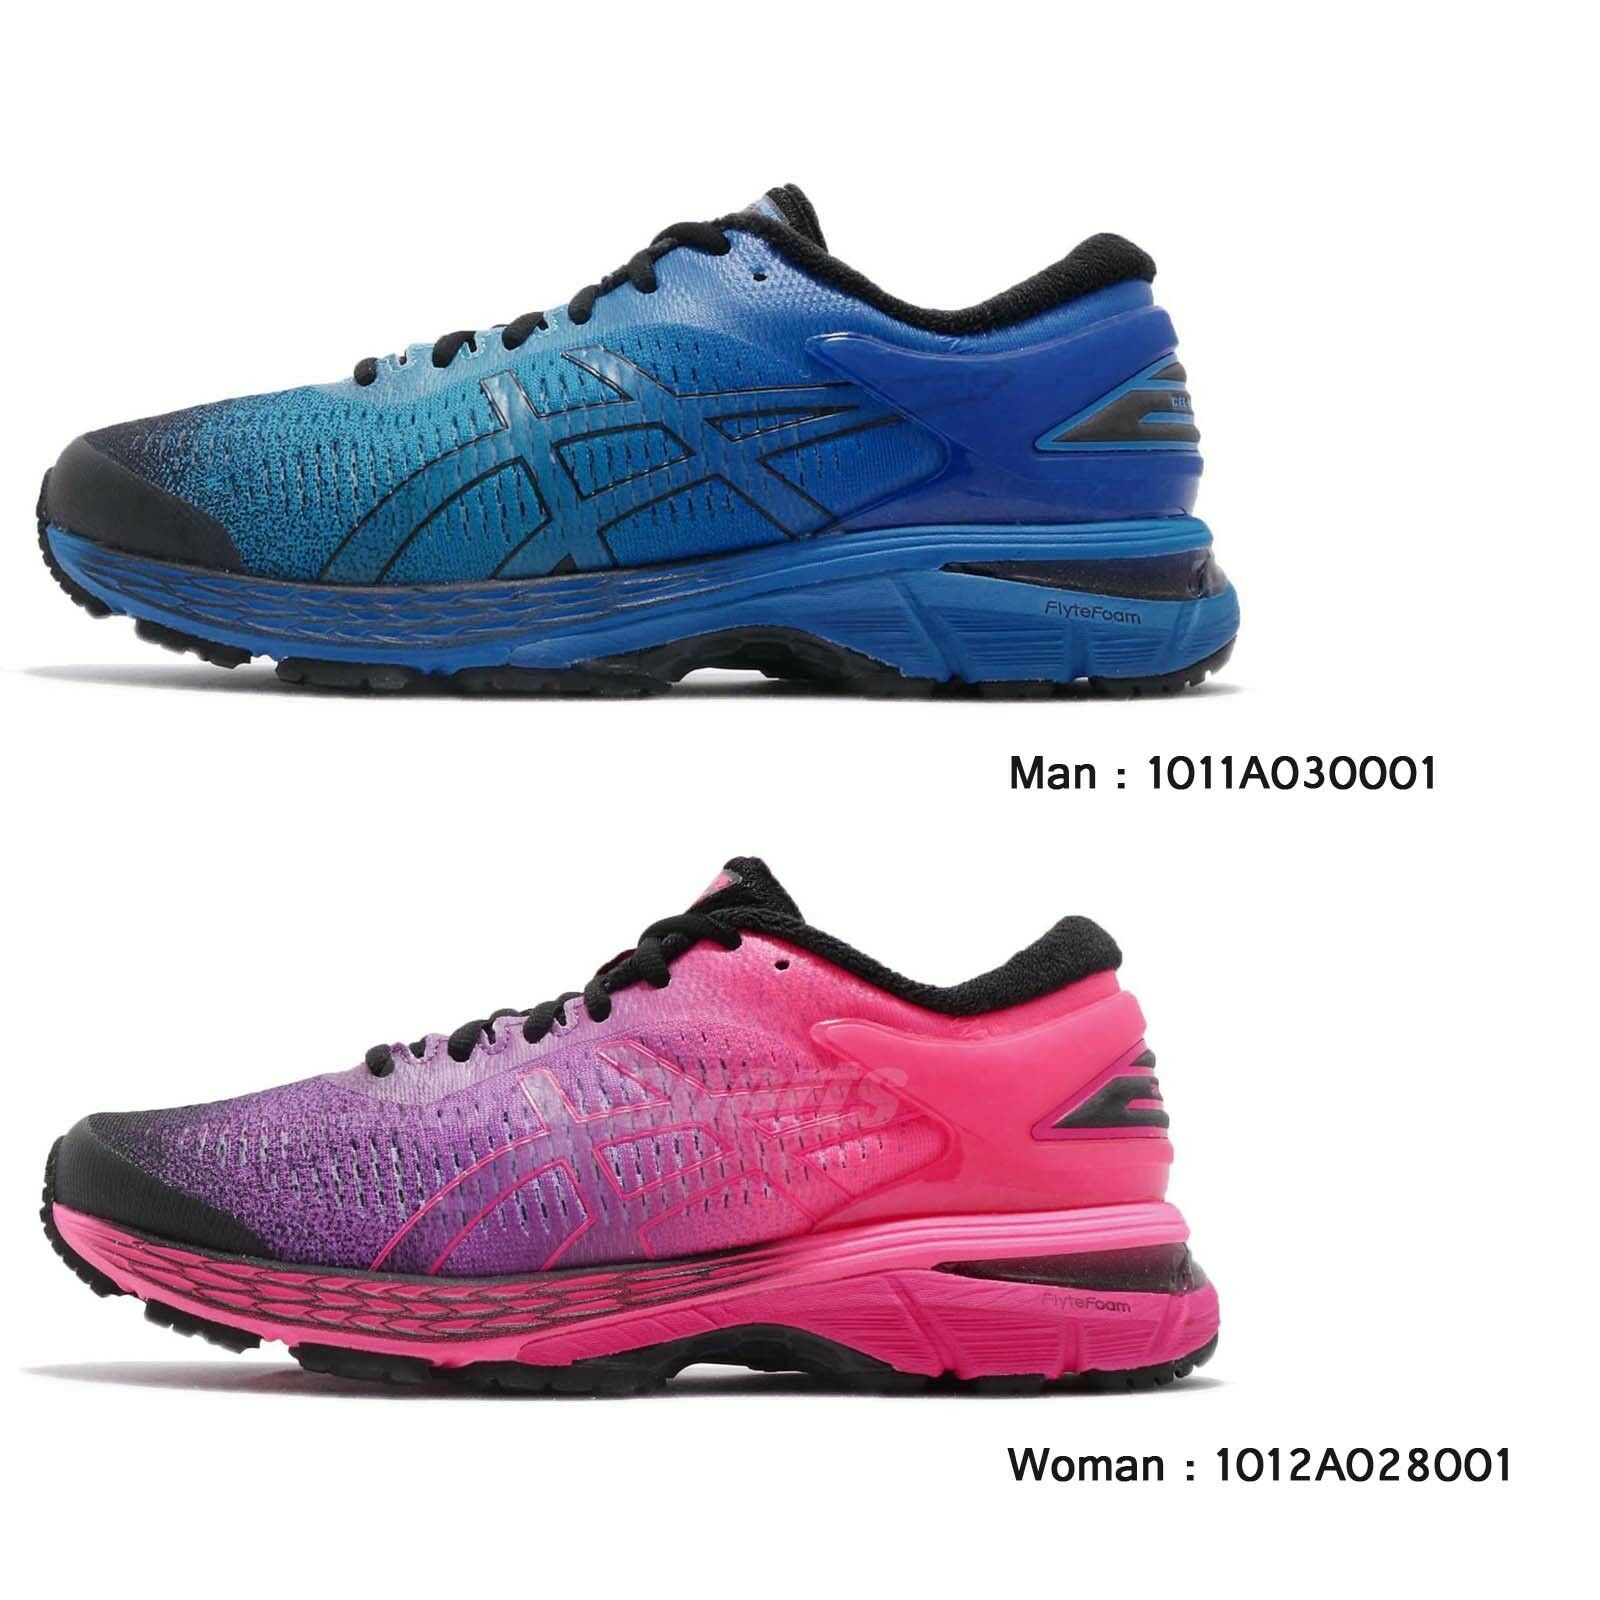 Asics Gel-Kayano SP 25 SP Gel-Kayano FlyteFoam Ducha Solar para Hombre para Mujer Calzado para Correr Elija 1 4bc08e